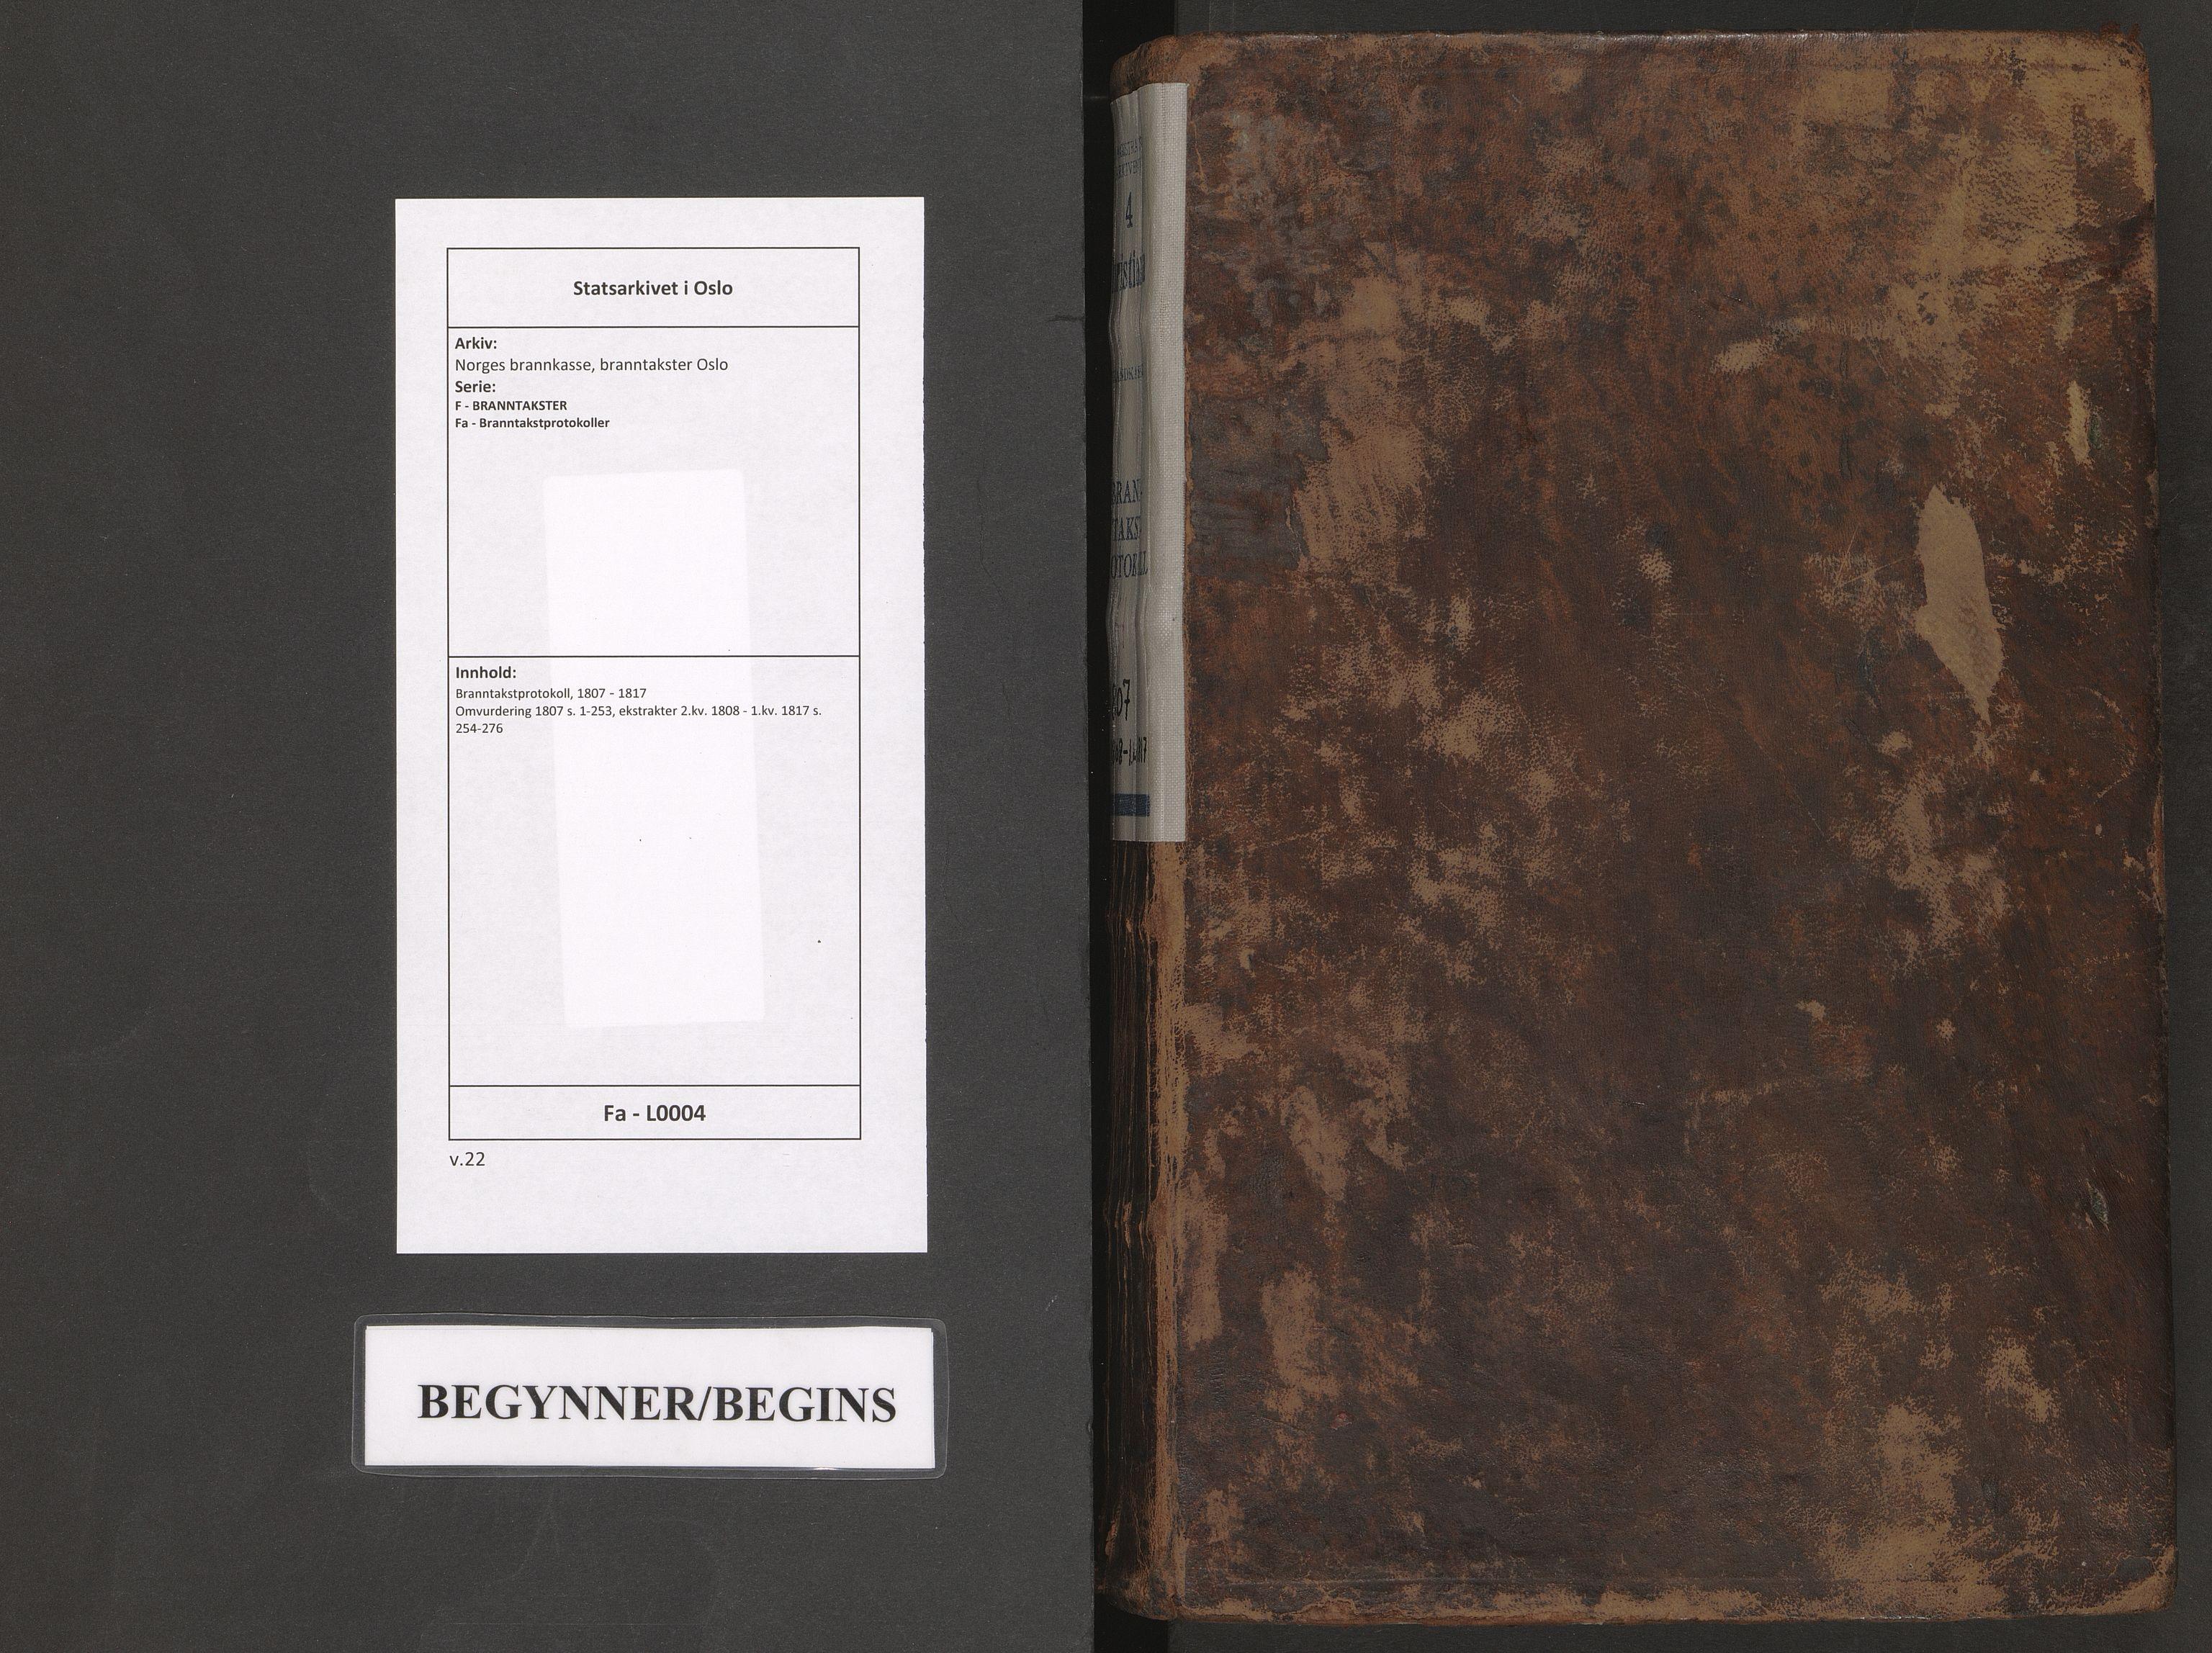 SAO, Norges brannkasse, branntakster Oslo, F/Fa/L0004: Branntakstprotokoll, 1807-1817